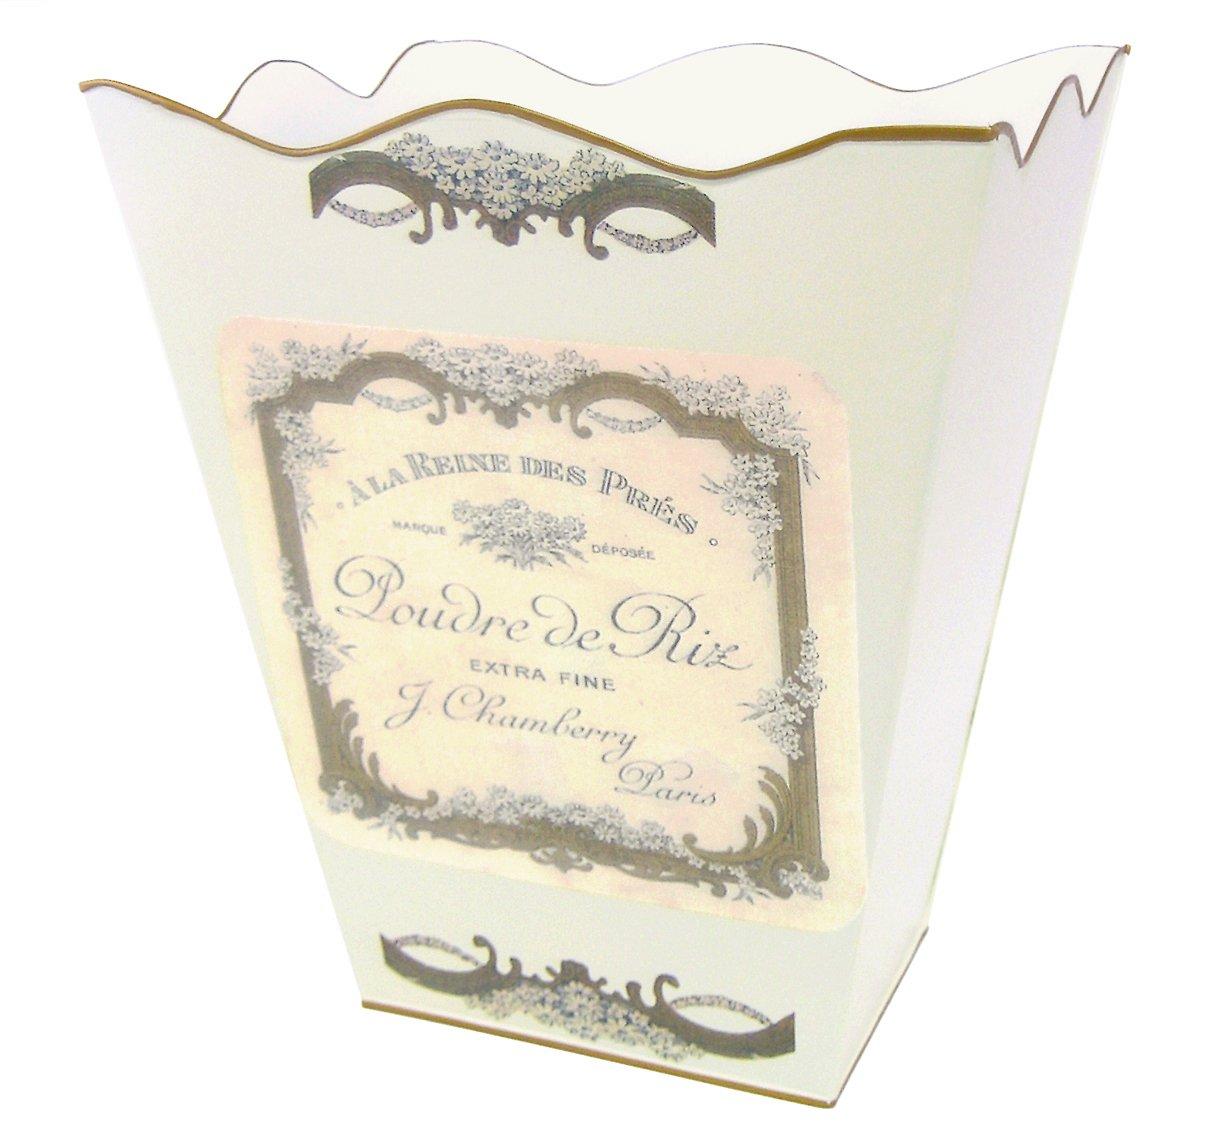 Retro Vintage Wastebasket E13 Trash Can, Trash Bin, Trash Basket ~ Shabby Chic Ivory Enamel with Vintage French Perfume Label. 0